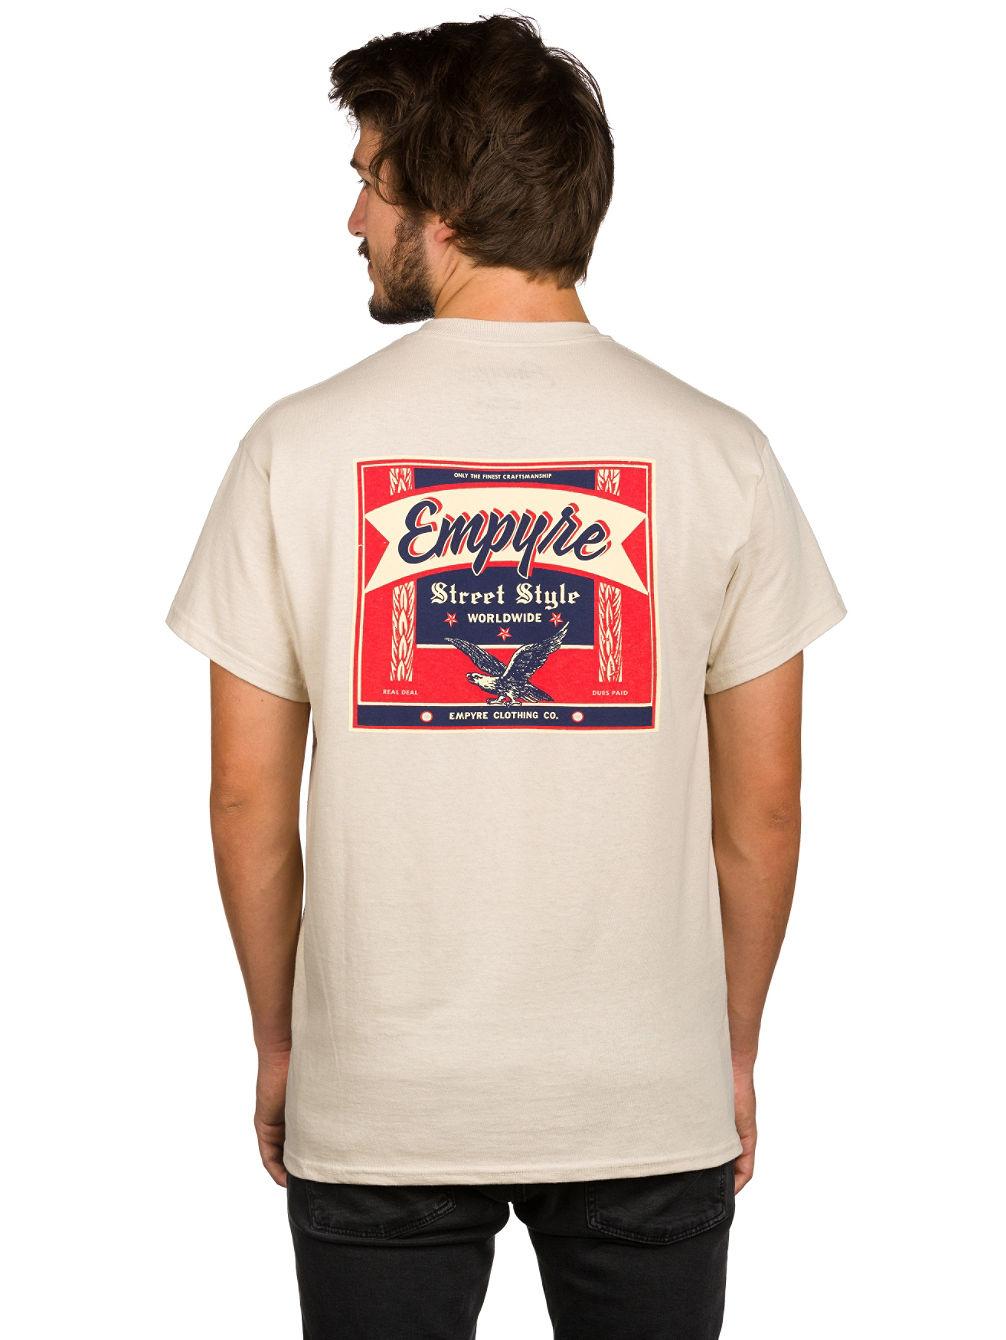 Empyre Street Style T-Shirt online kaufen bei blue-tomato.com